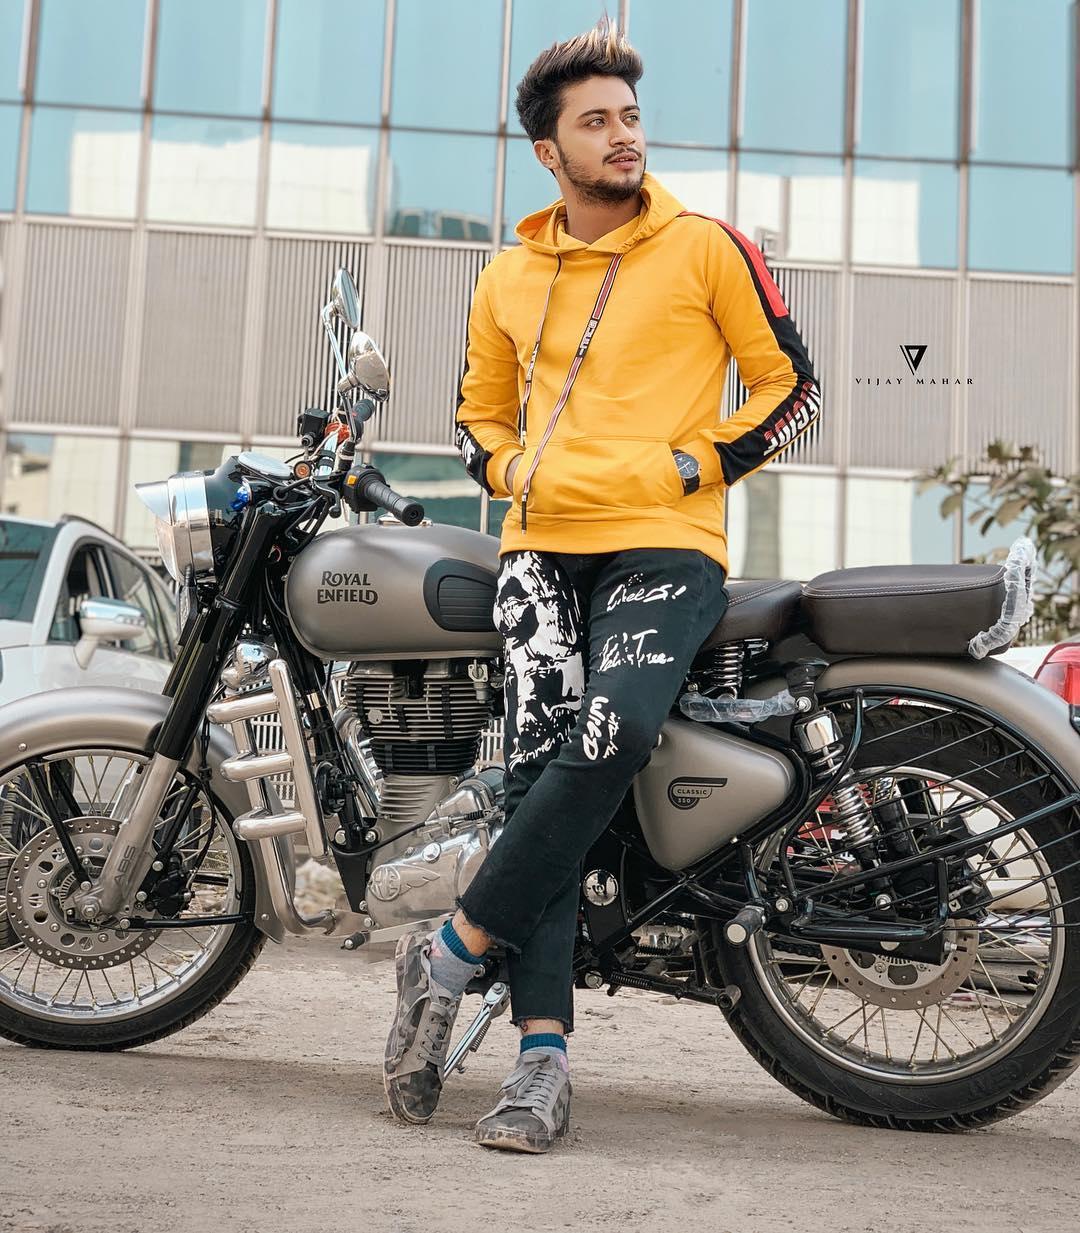 Hasnain Khan (TikTok Star) Wiki, Age, Bike, Bio, Girlfriend, Income & More